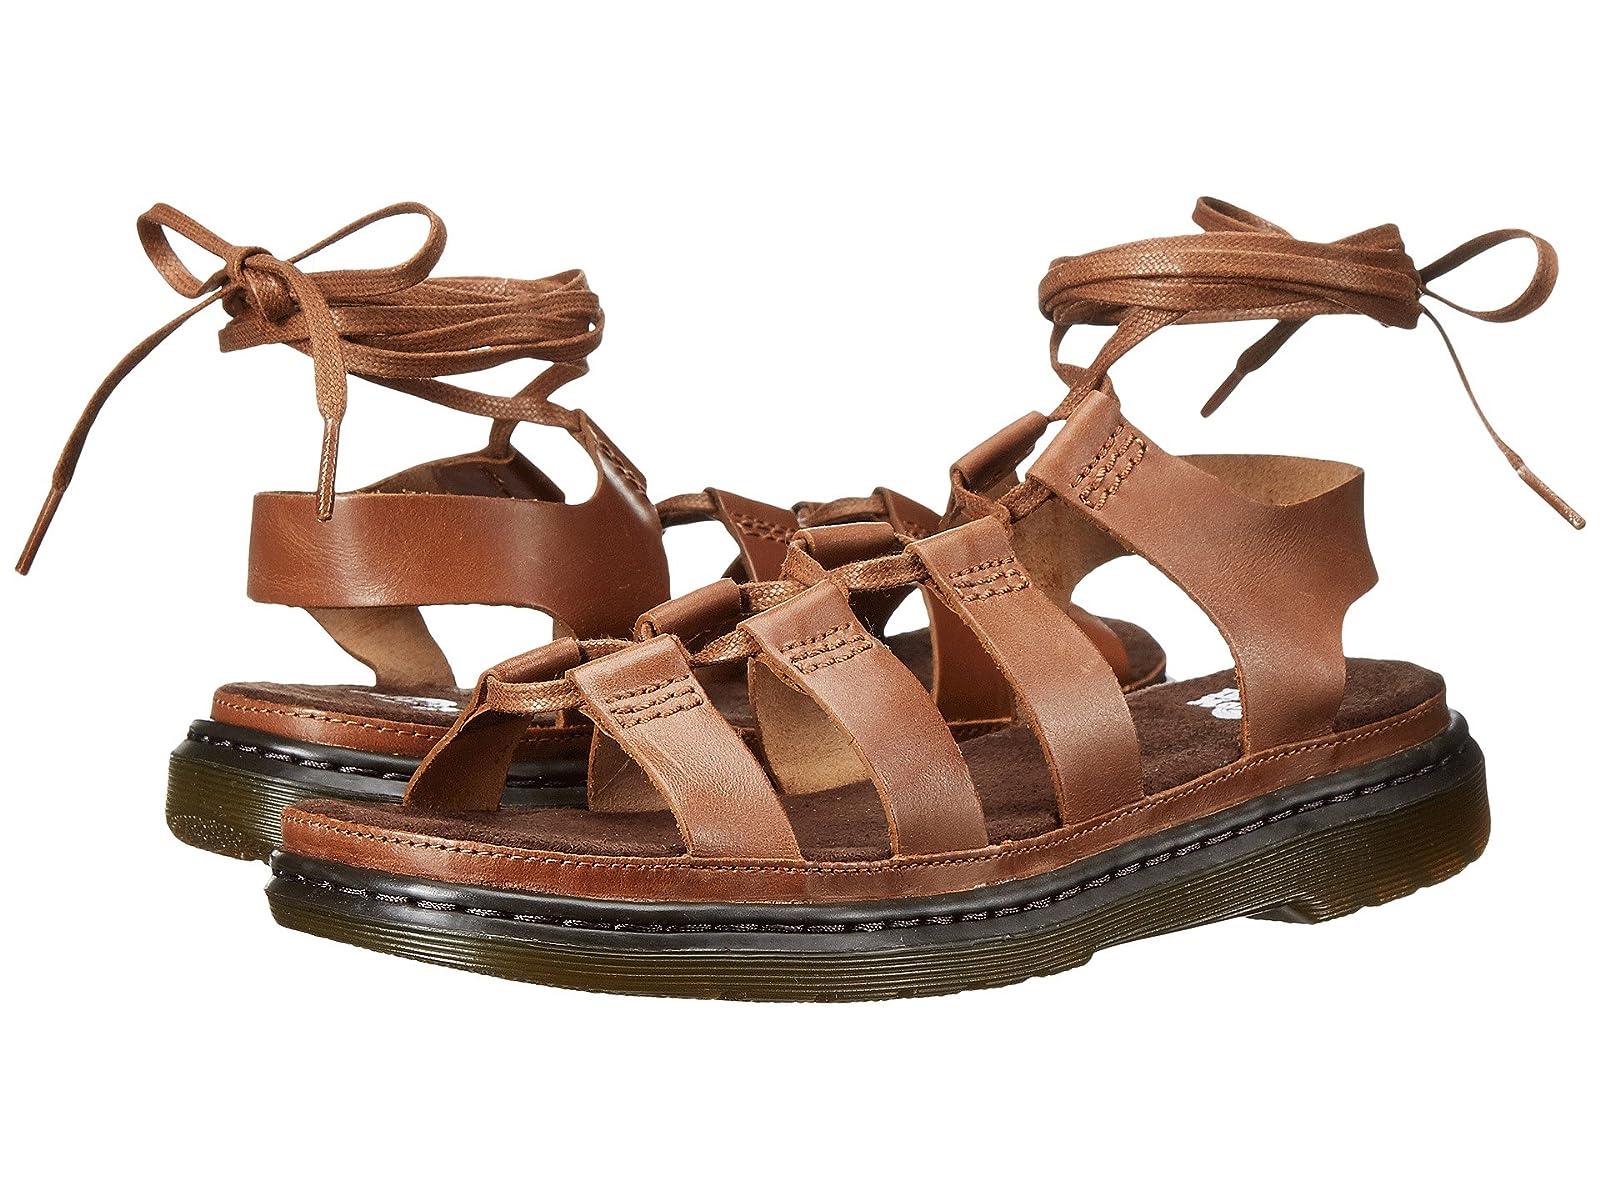 Dr. Martens Kristina Ghillie SandalComfortable and distinctive shoes